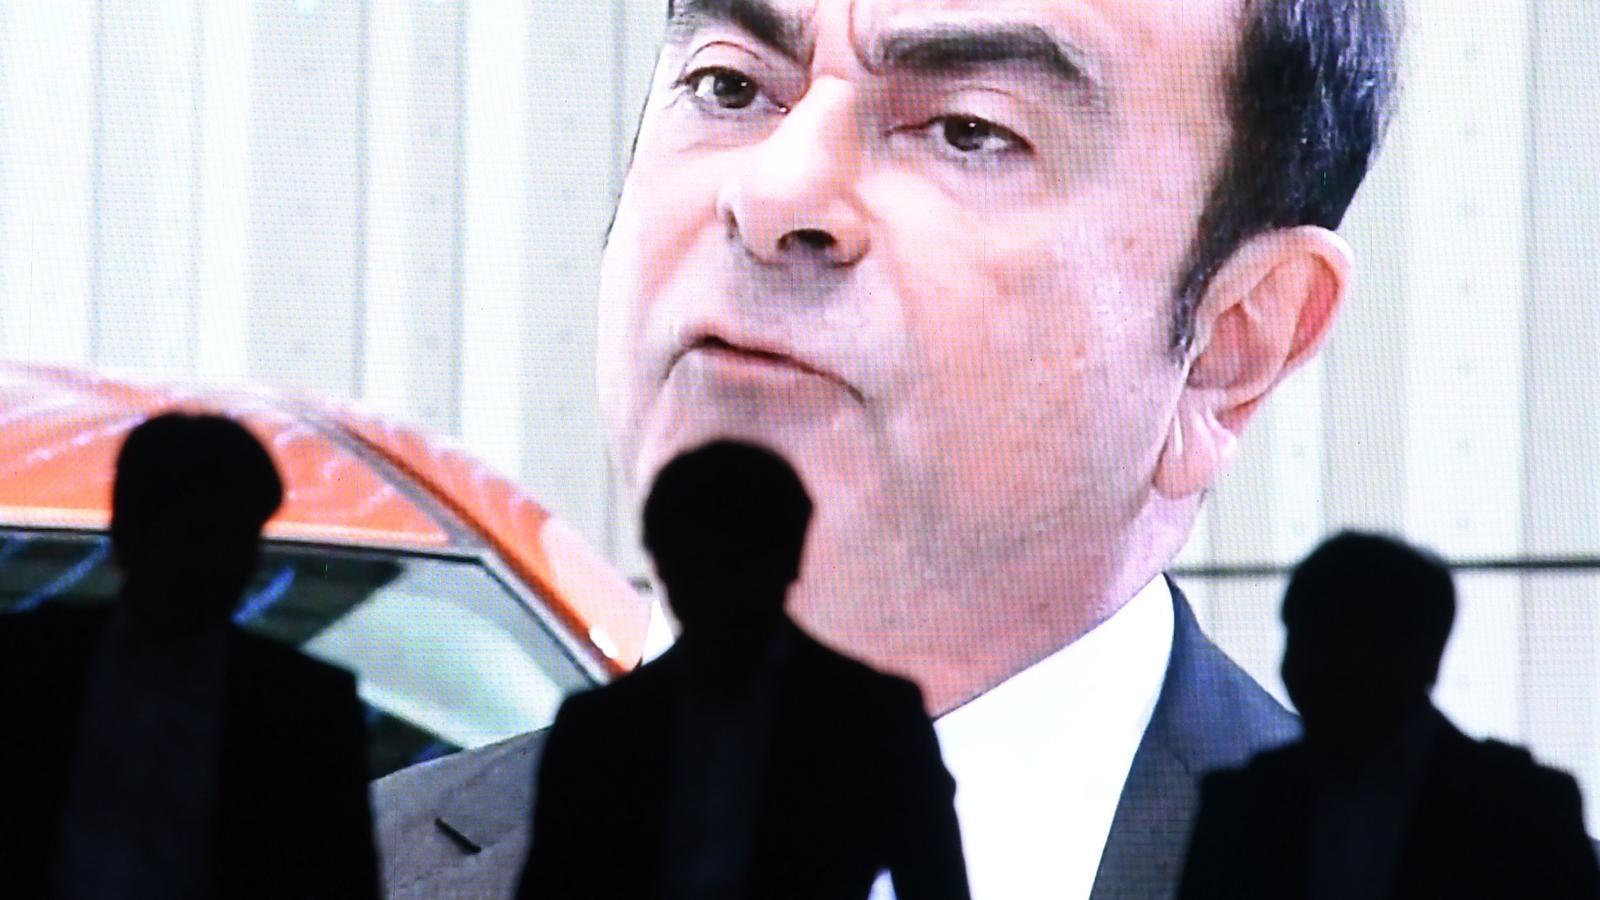 L'arrest de Ghosn debilita Renault